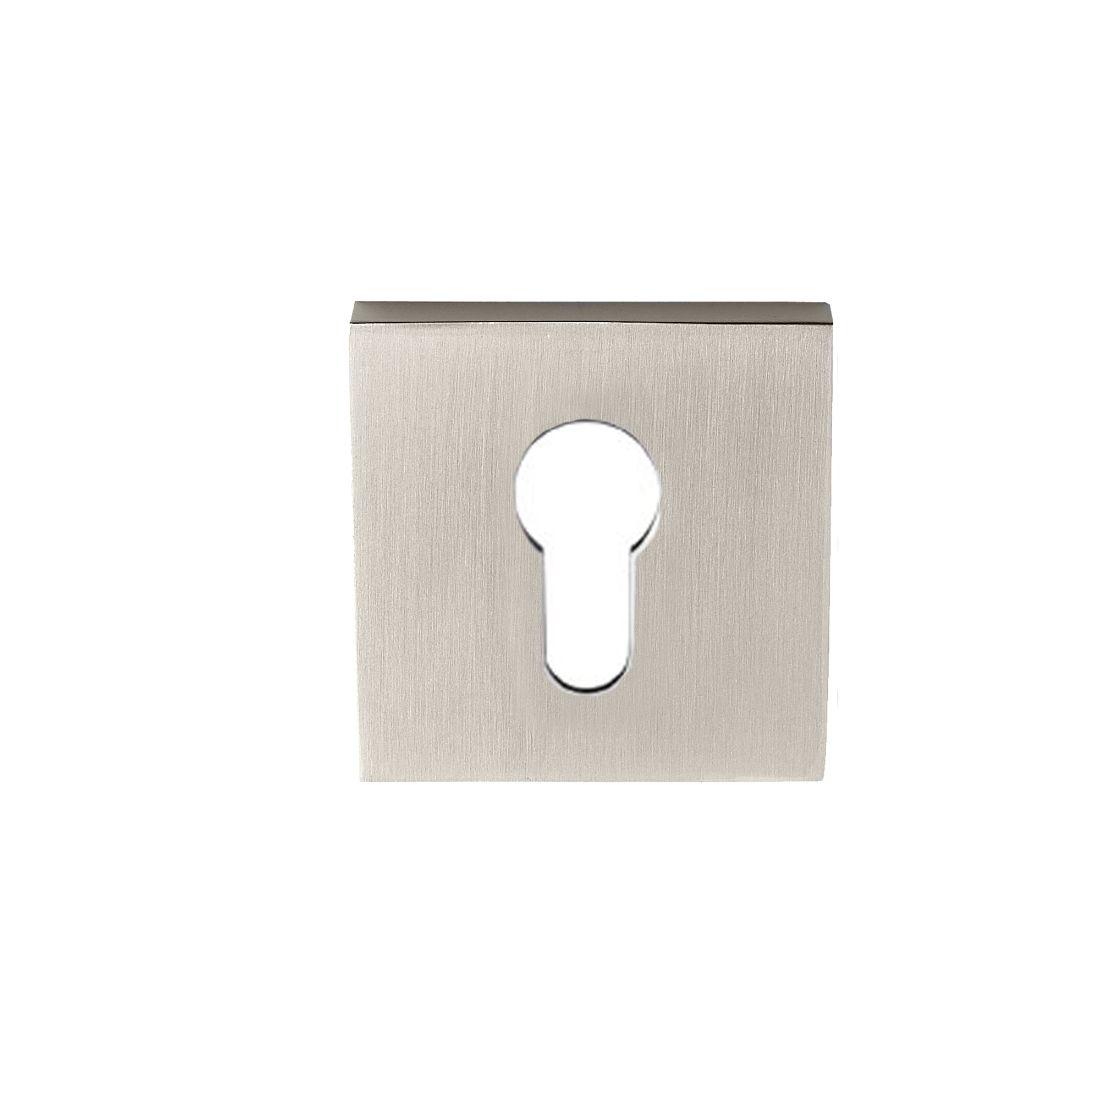 Square 55mm Euro Escutcheon Brushed Nickel